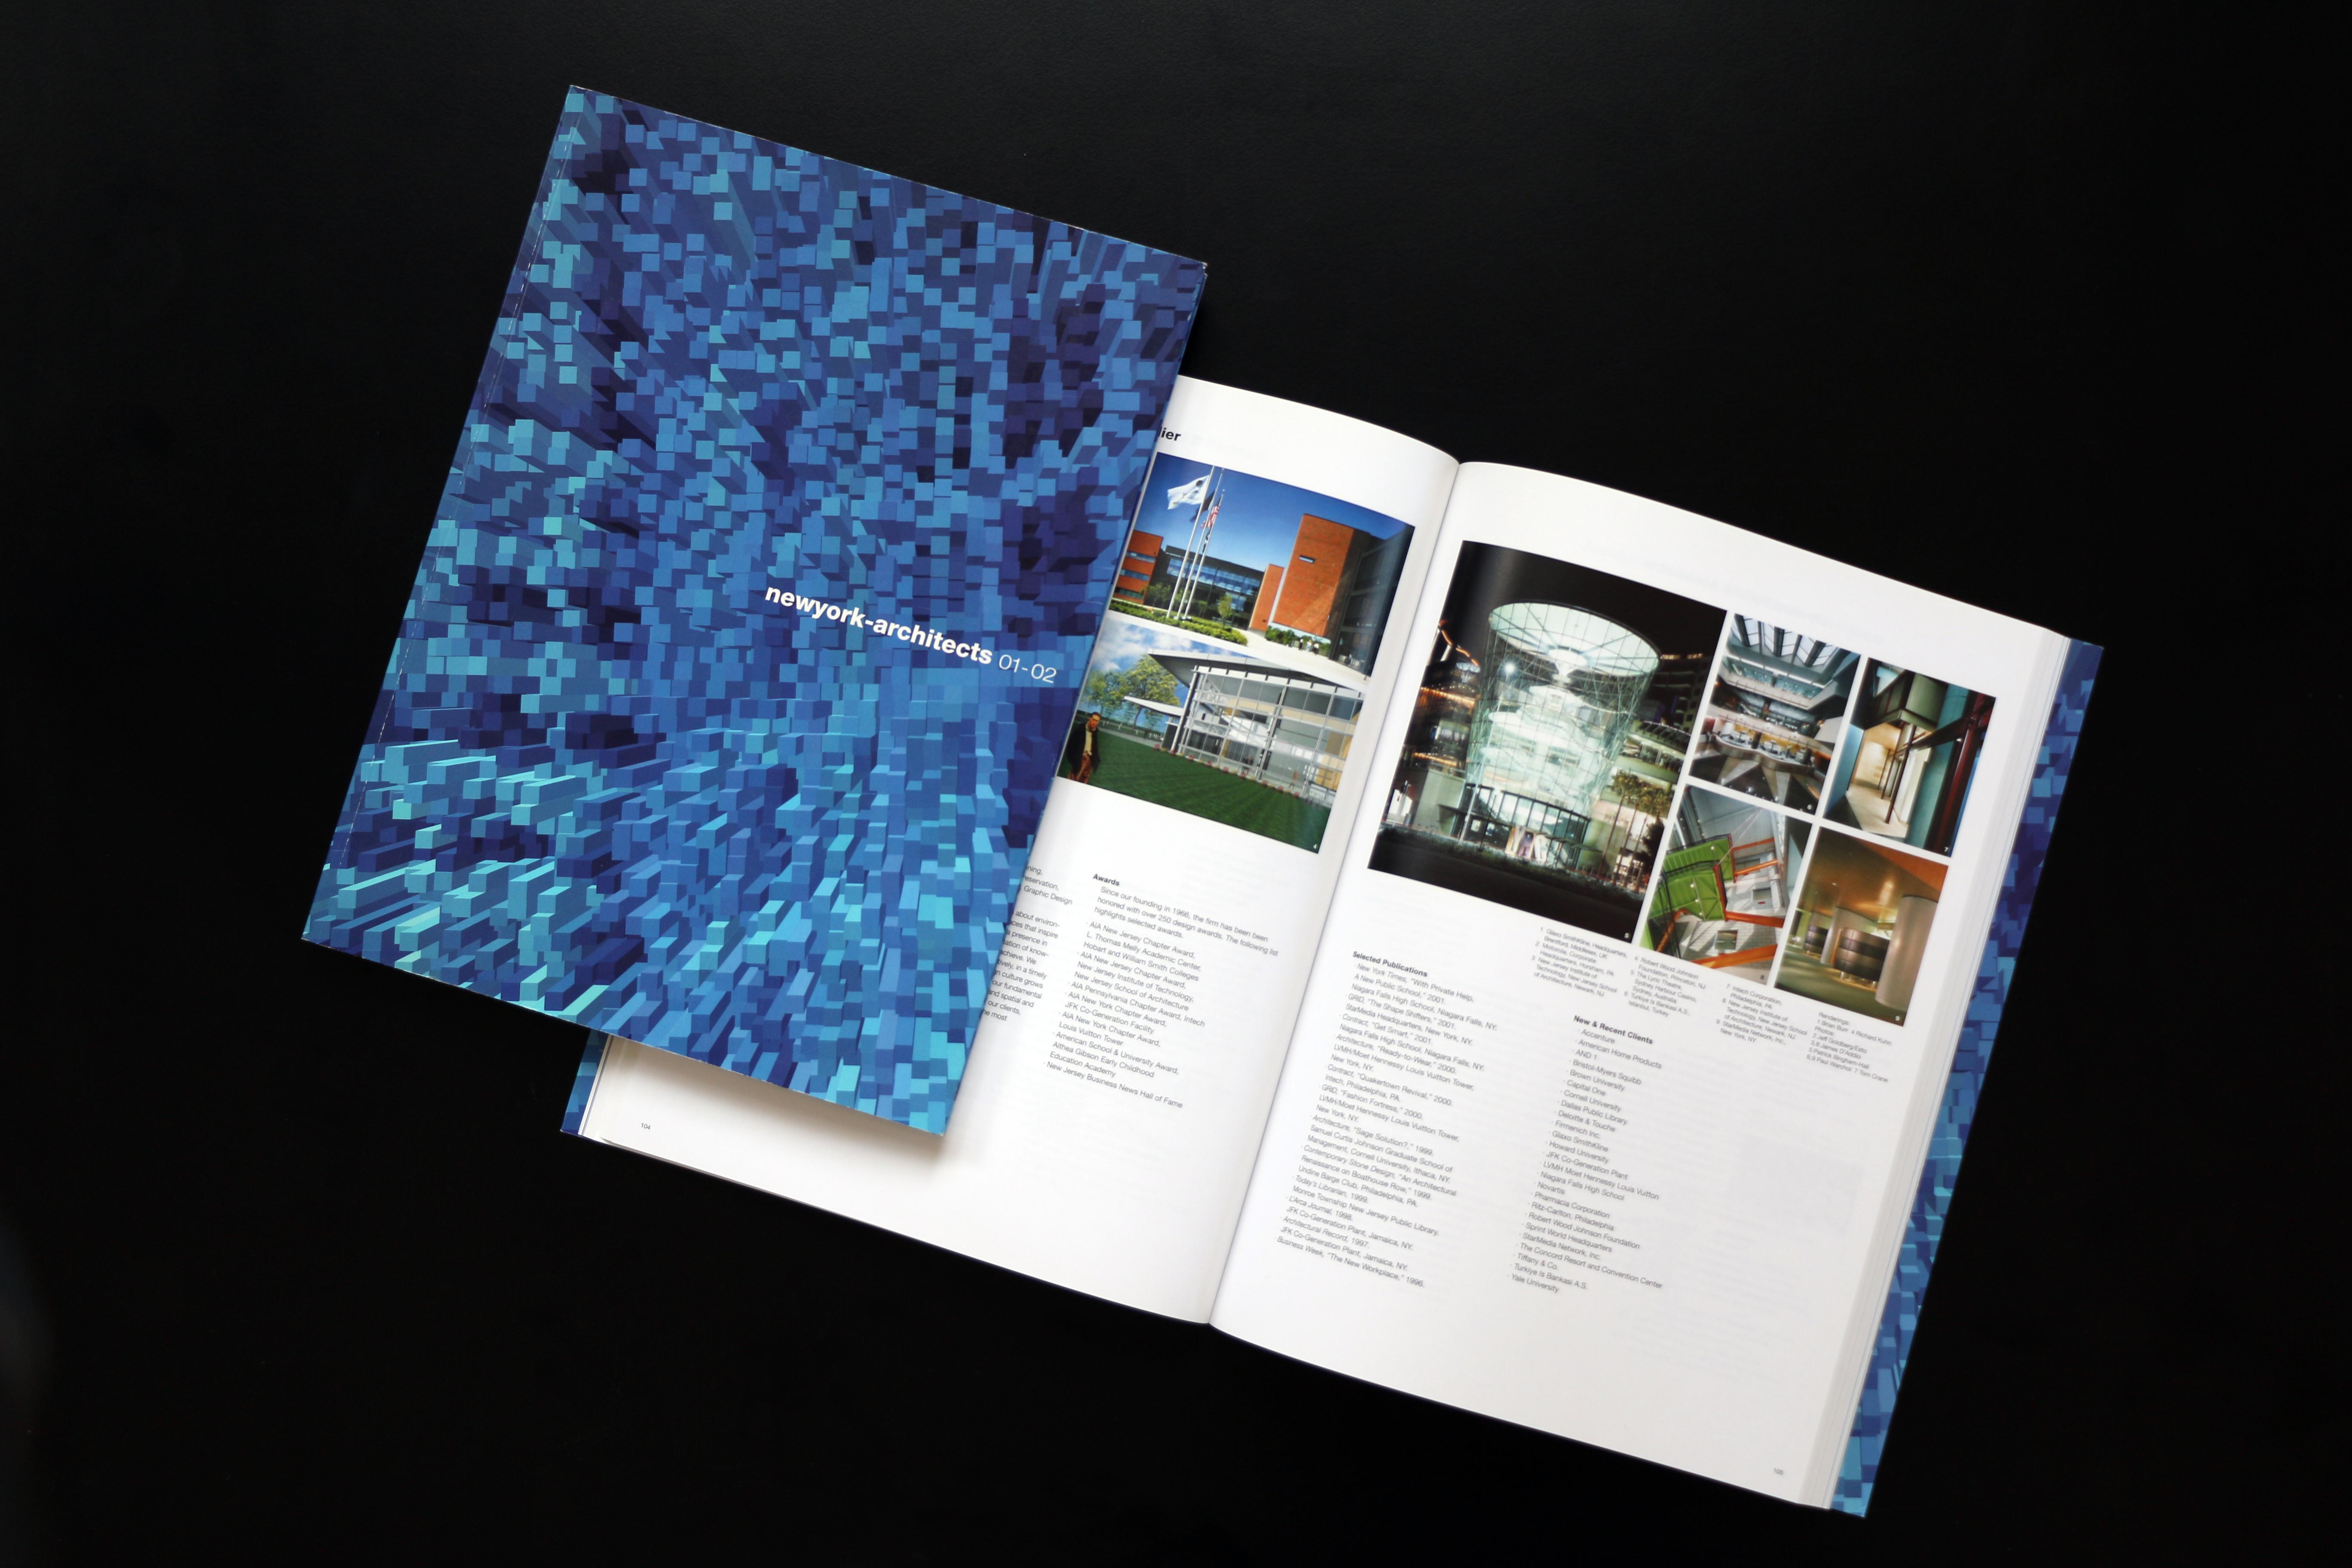 newyork-architects 2001/02